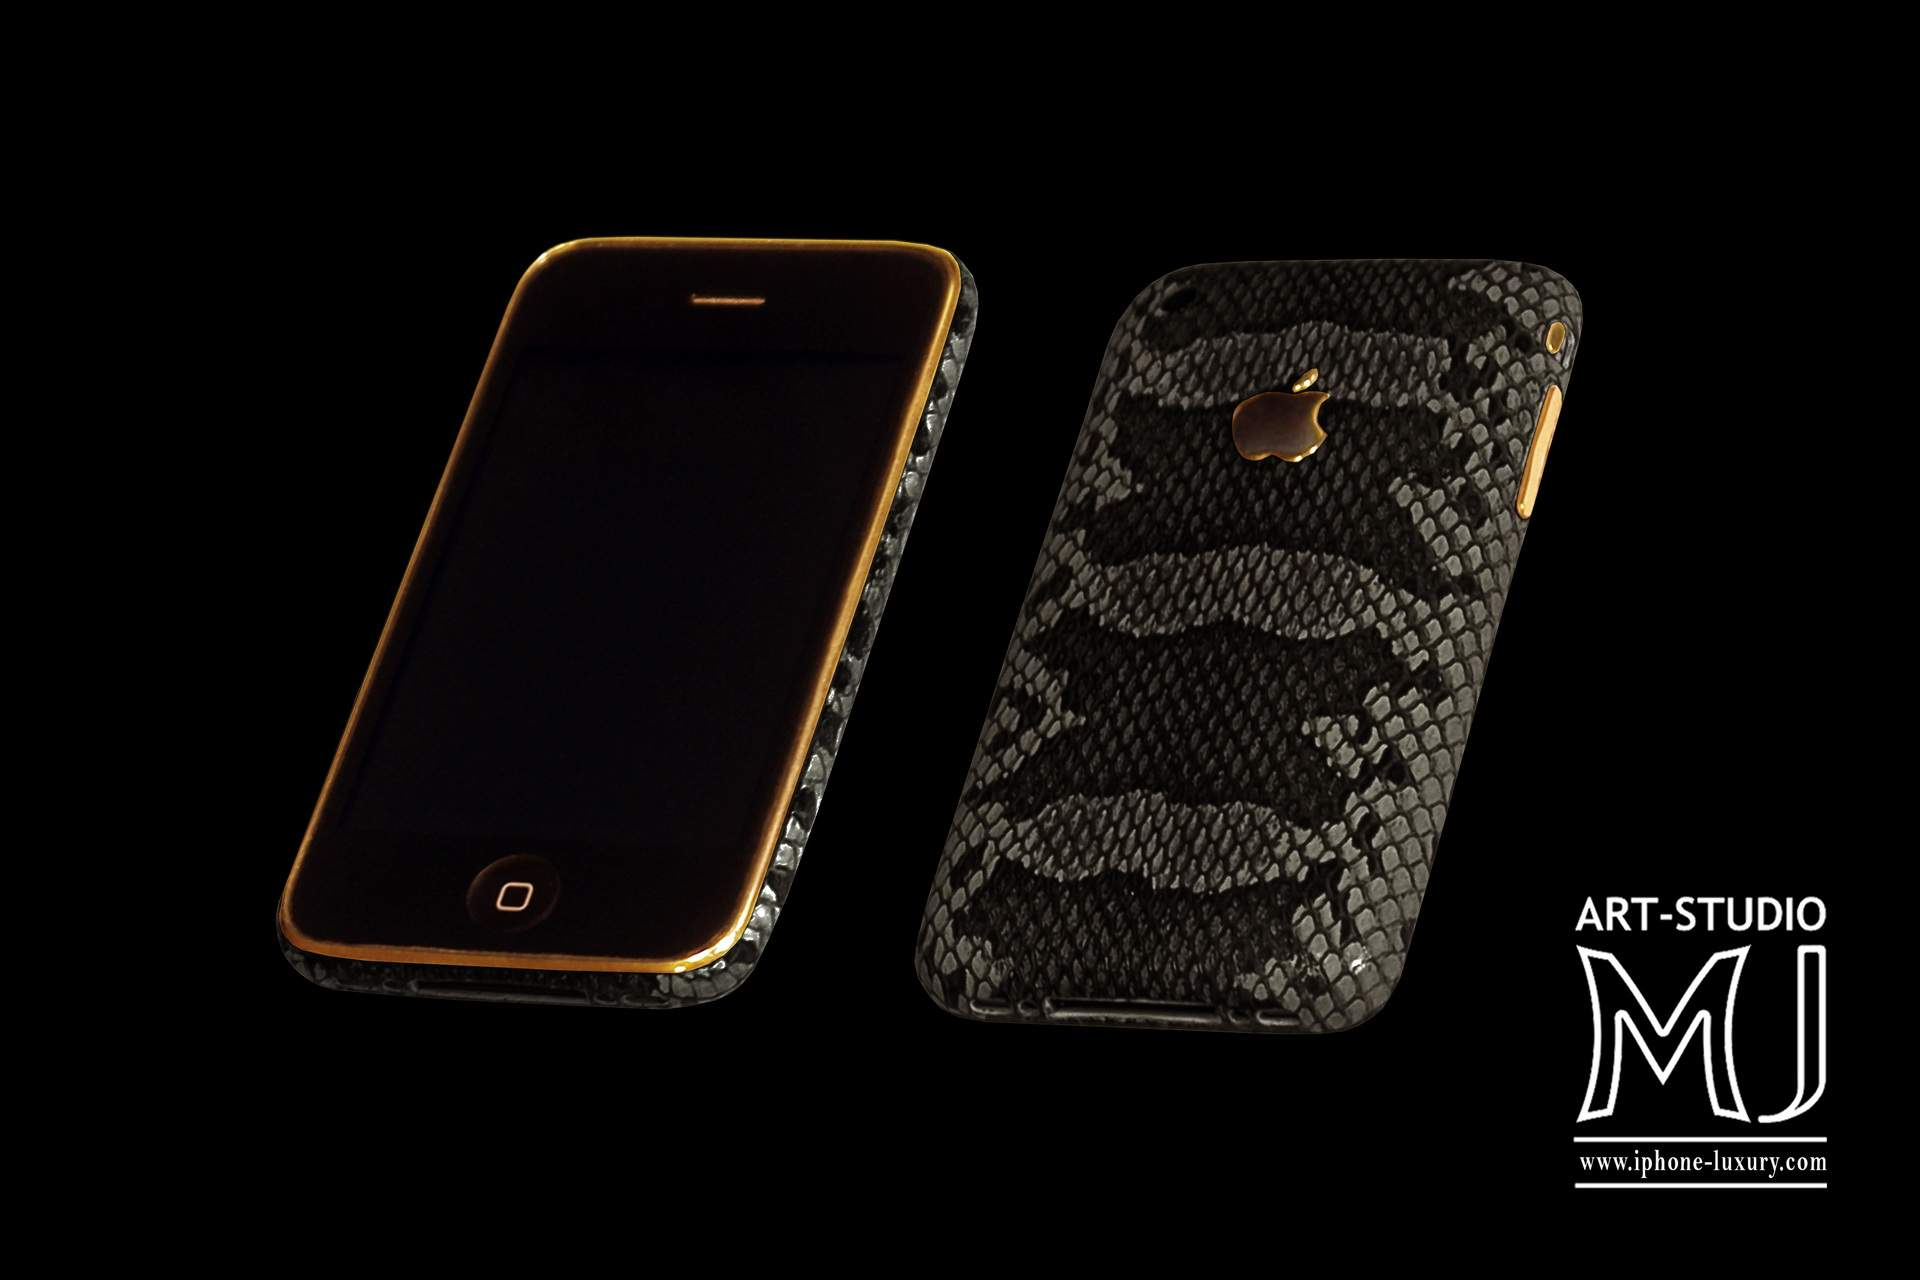 http://www.mj.com.ua/pic/black/290212/Mobile/Apple%20iPhone/Apple%20iPhone%203G%20MJ%20Leather%20Gold%20Python%2016gb%20Black%20Gold%20750.jpg